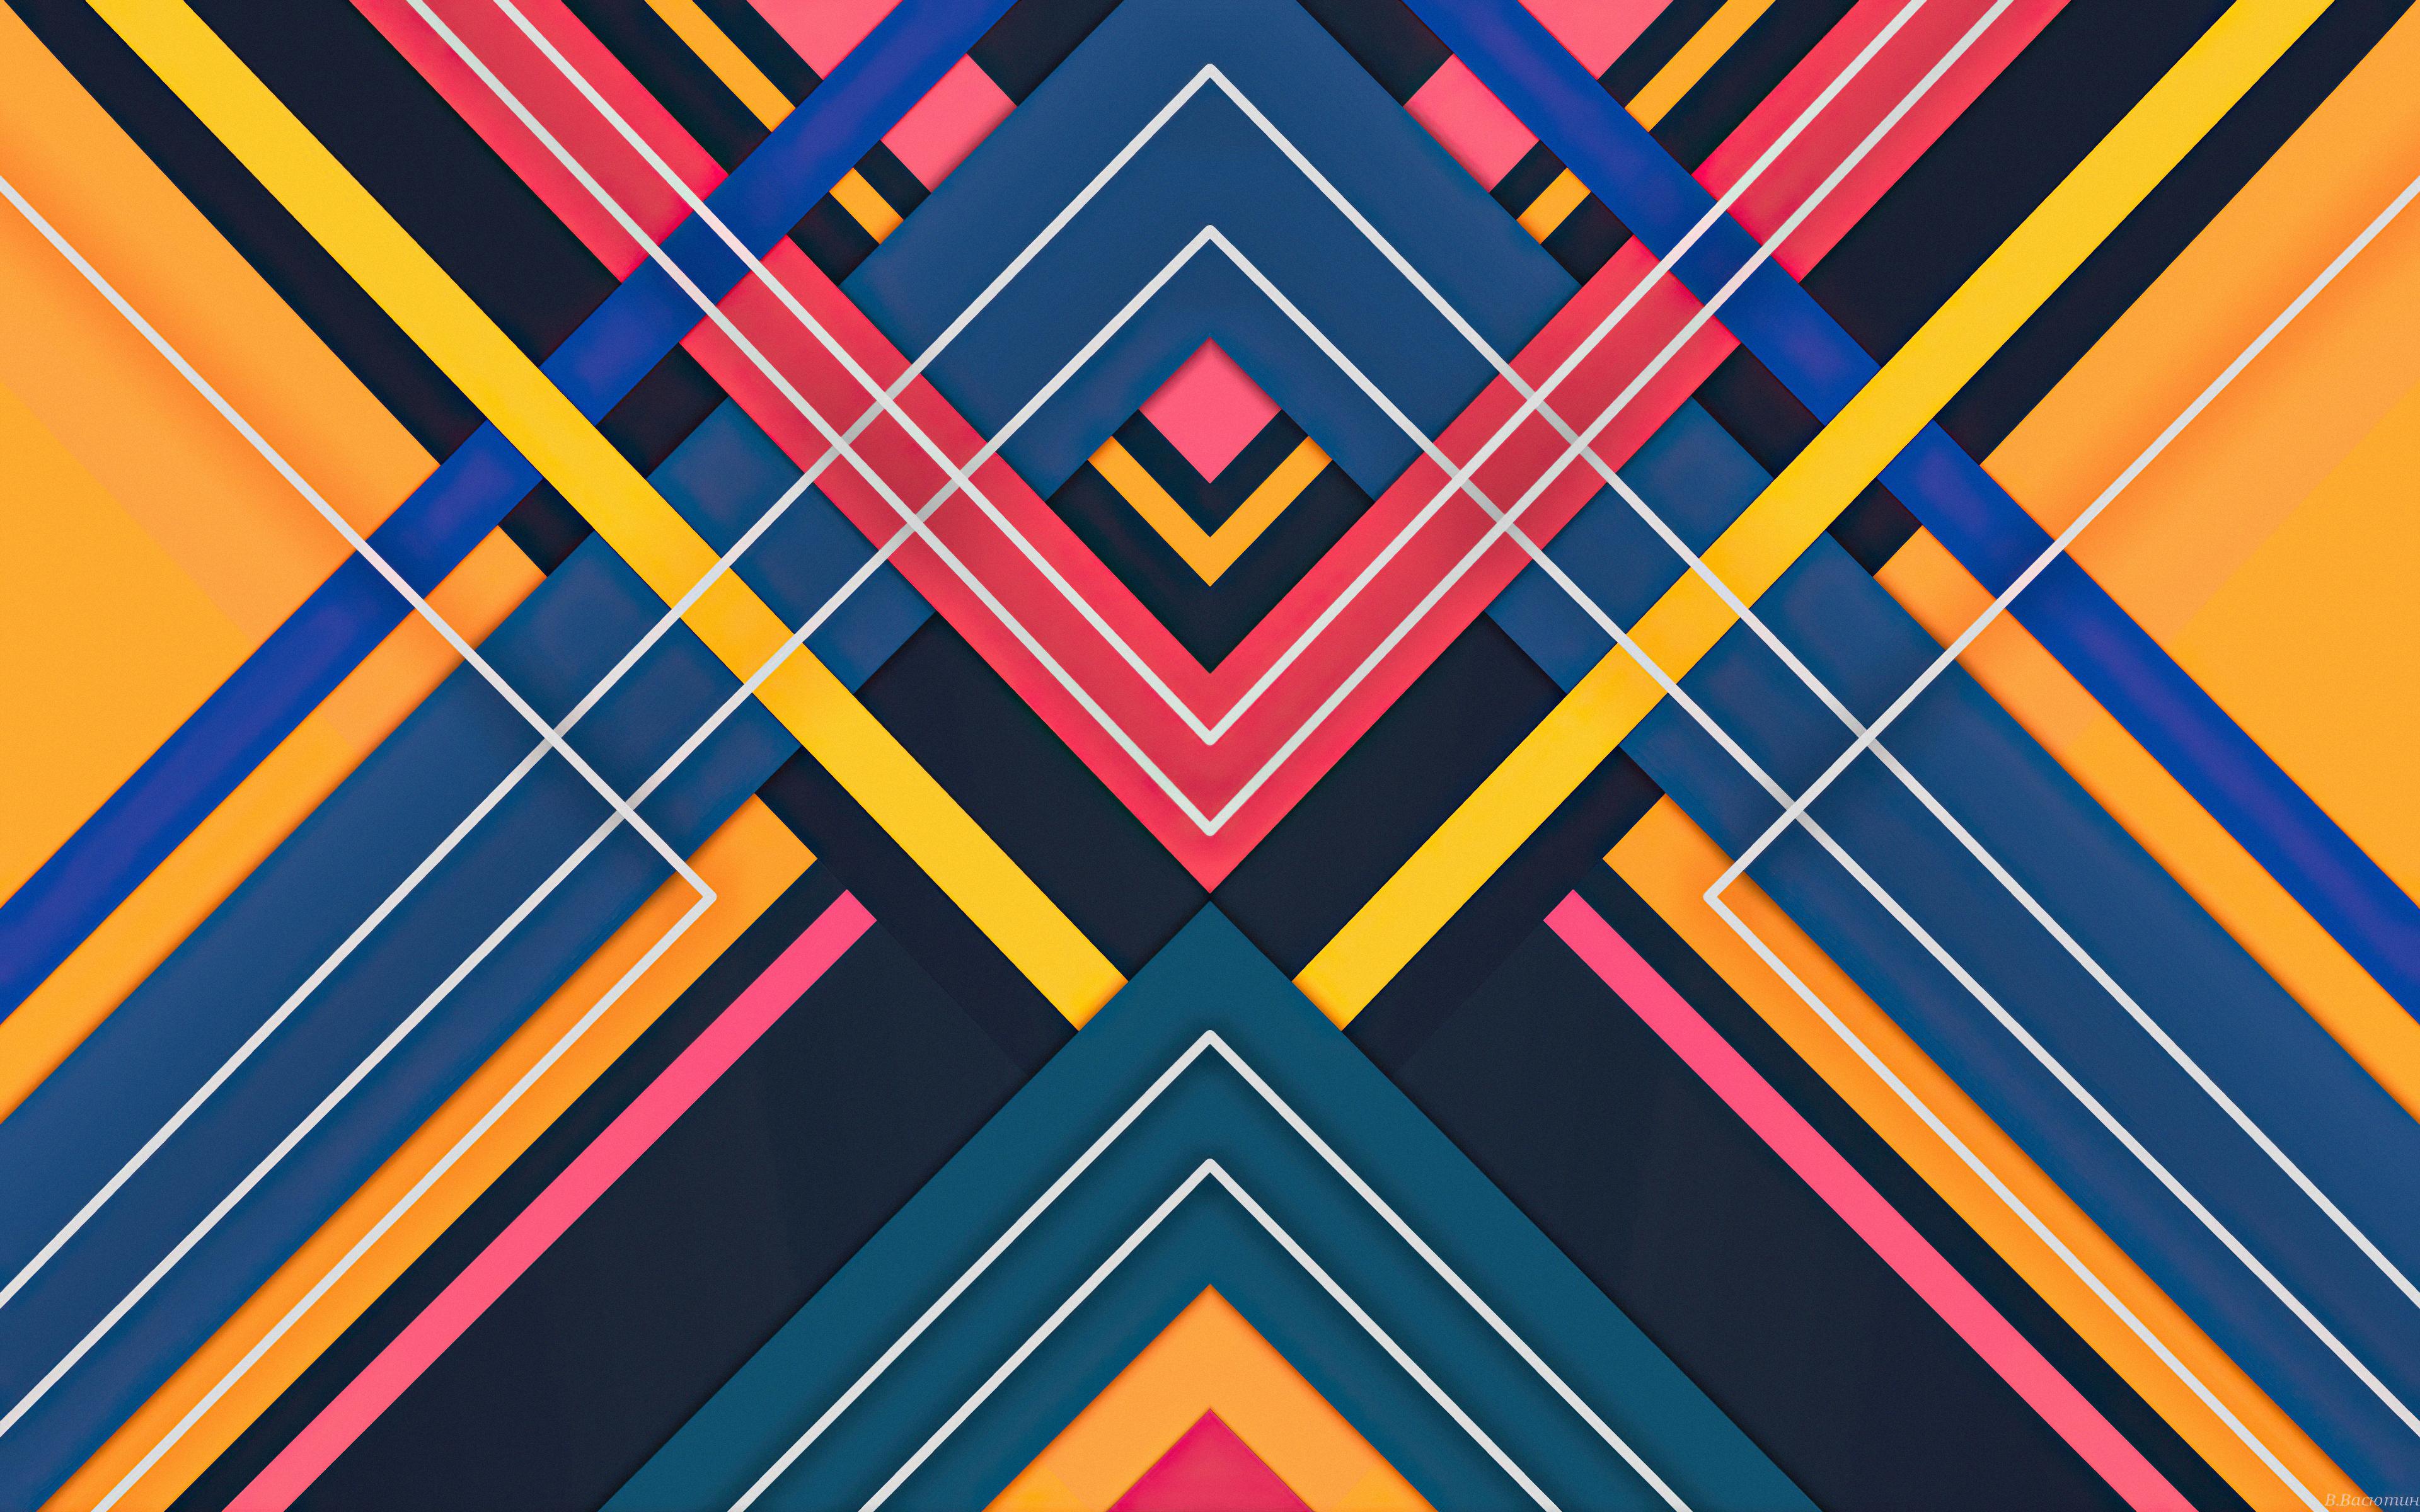 geometry-patterns-4k-rc.jpg